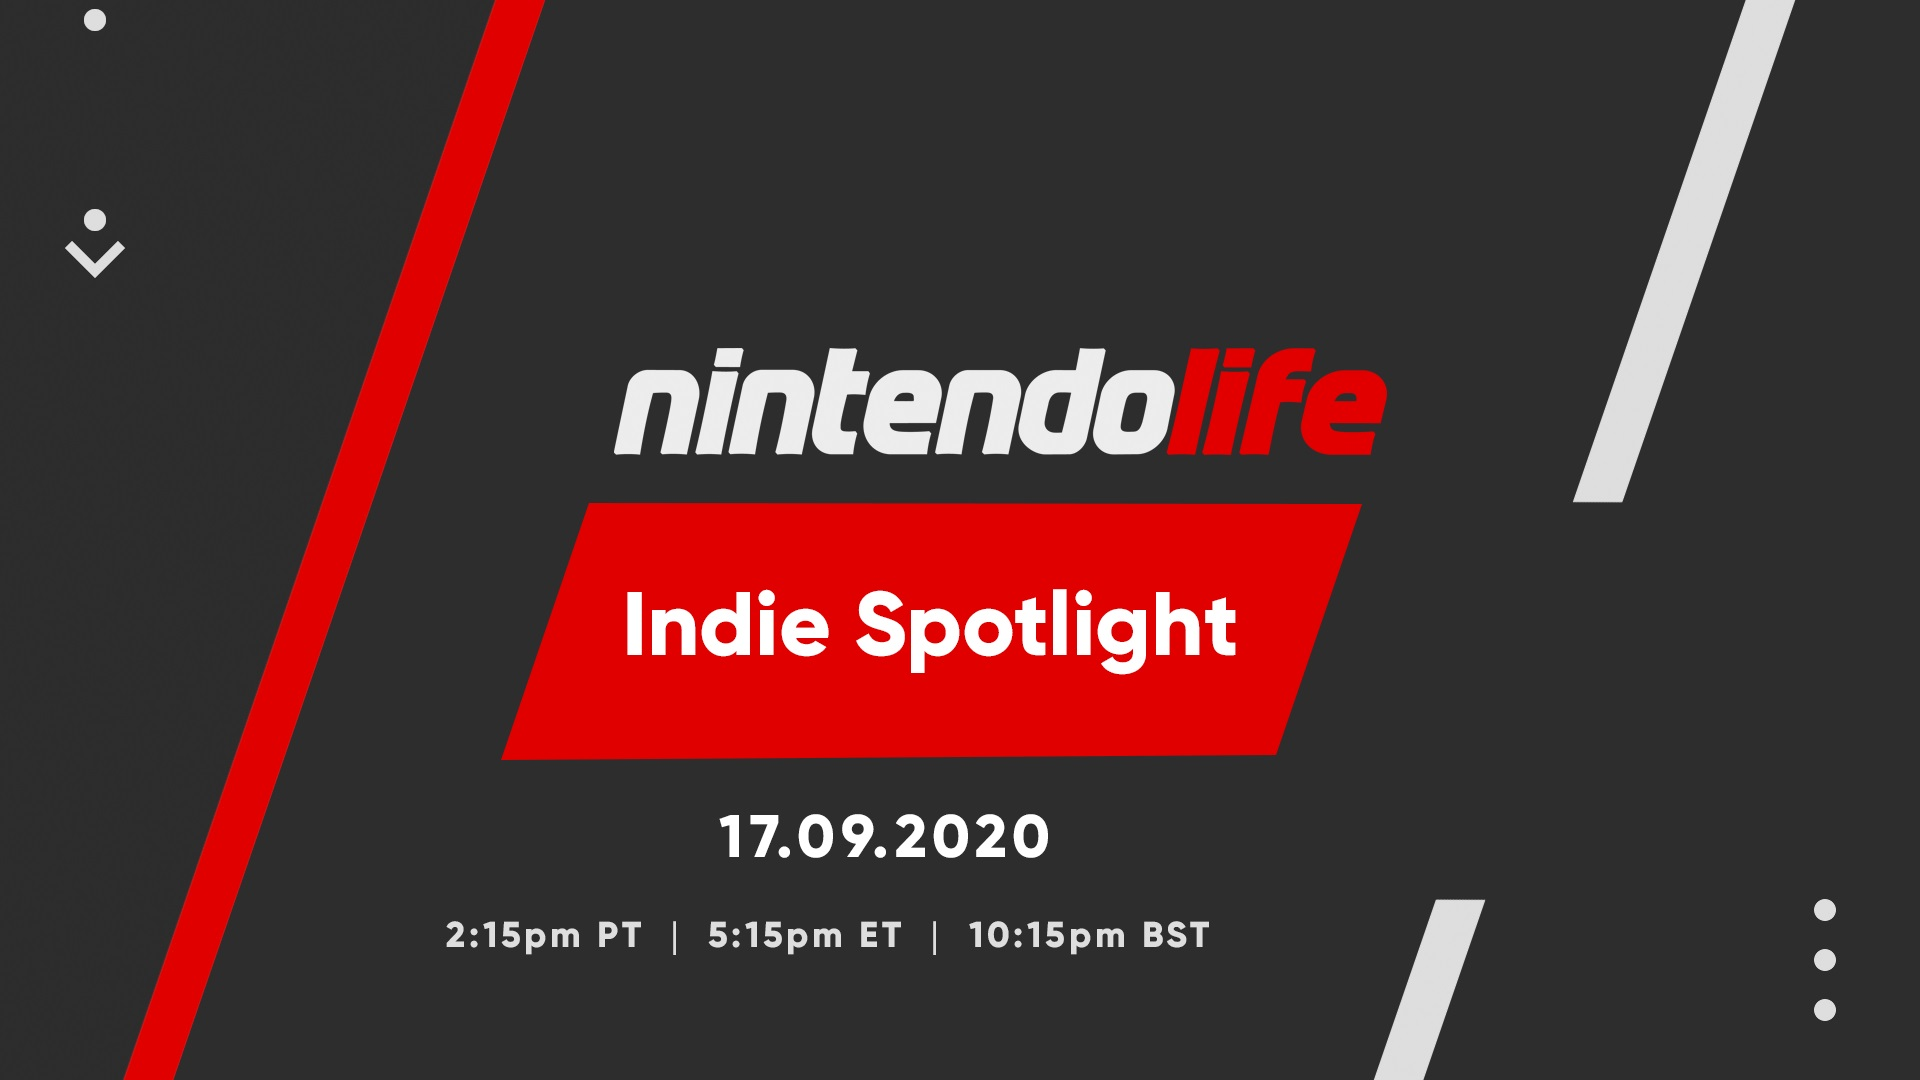 Nintendo Life Indie Spotlight